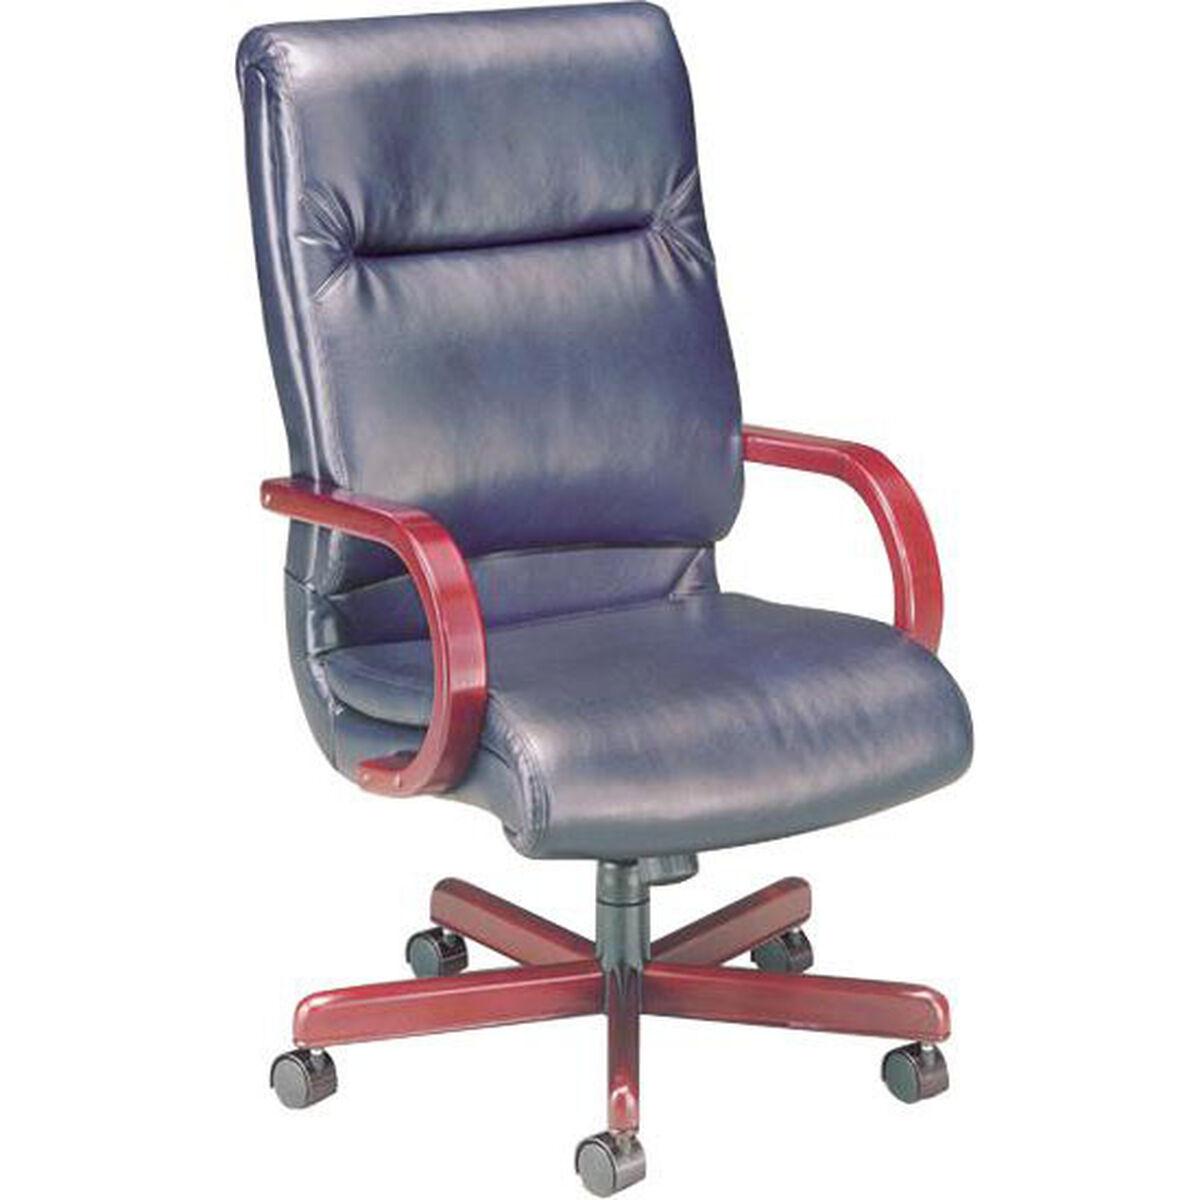 High Point Furniture Industries 1211 Hpf 1211